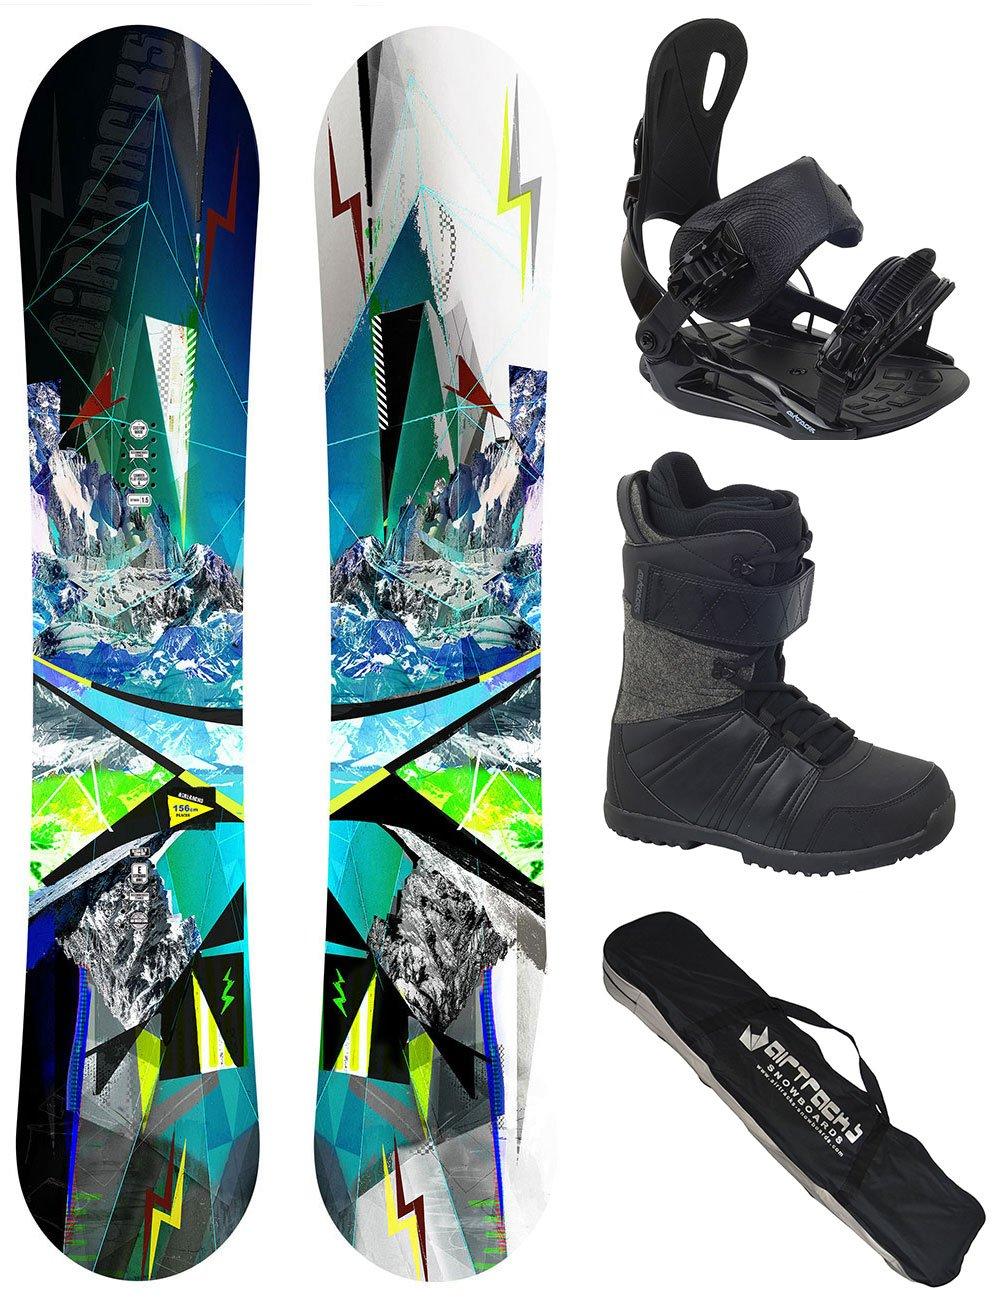 Snowboardboots AIRTRACKS Snowboard Set//Board Places Wide Flat Rocker Sb Bag // 156 159 165 cm Snowboard Binding Star